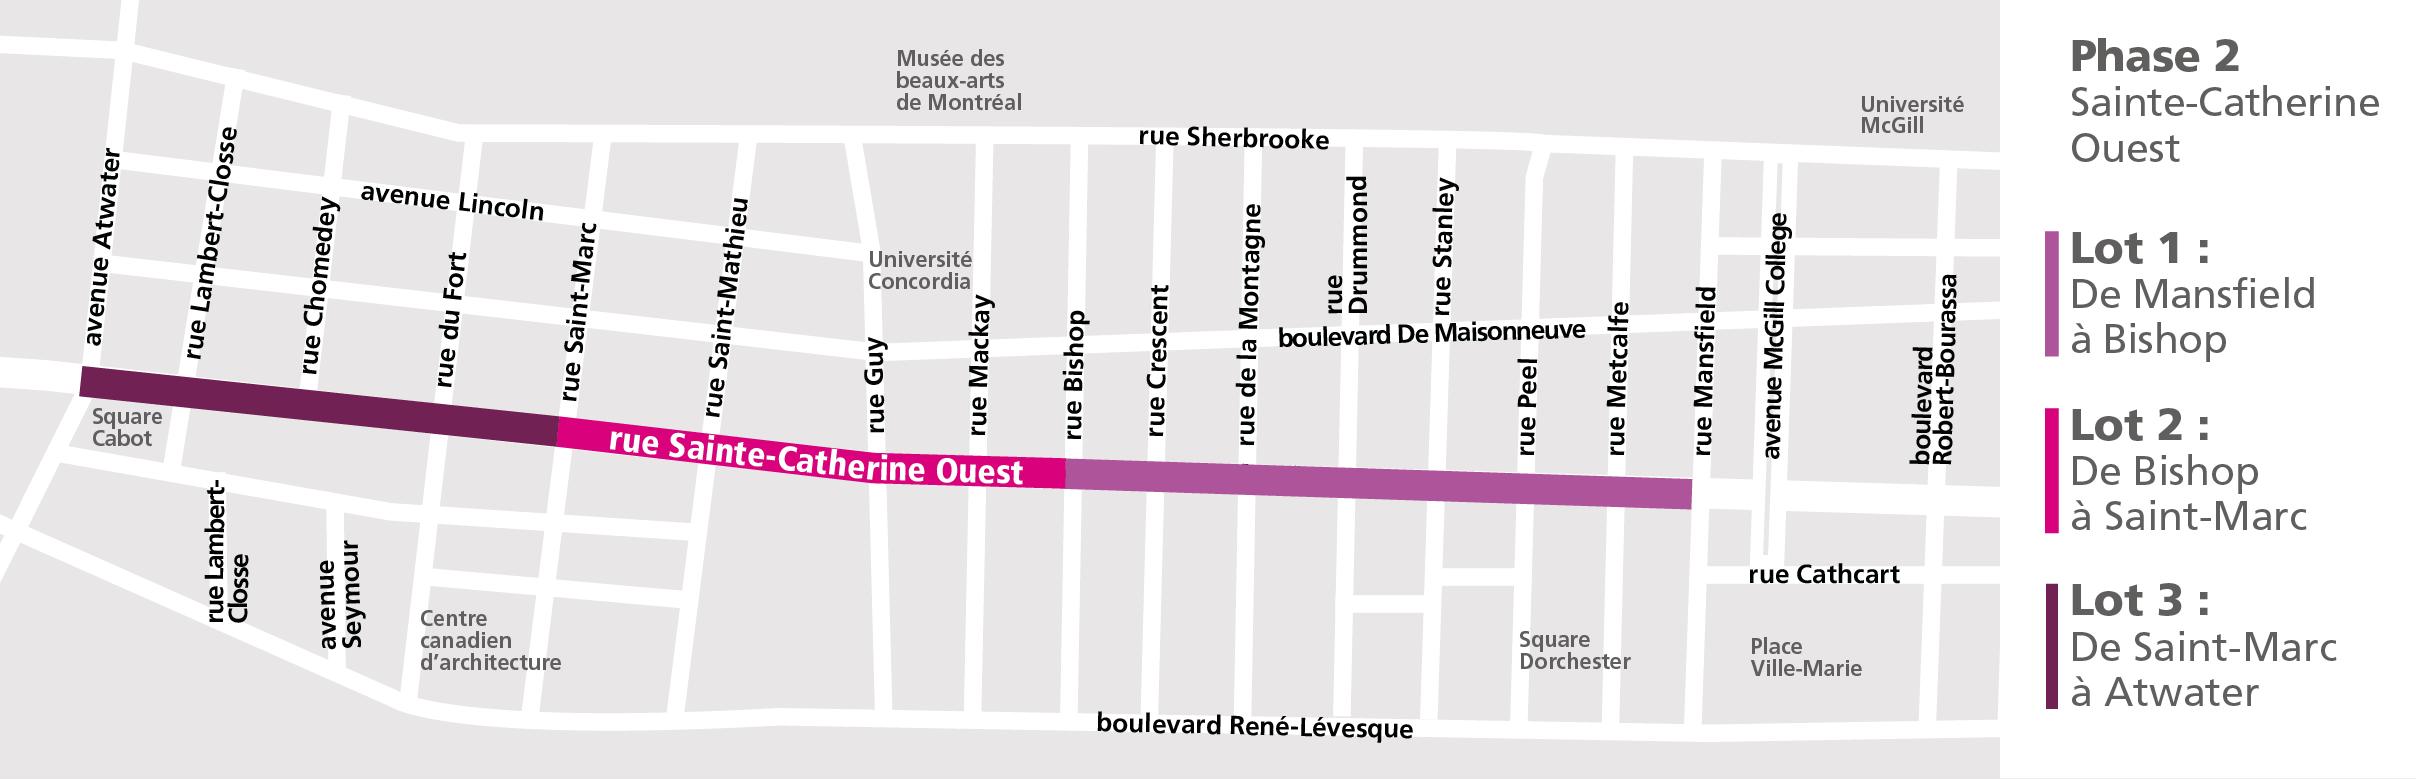 Phase 2 - Projet Sainte-Catherine